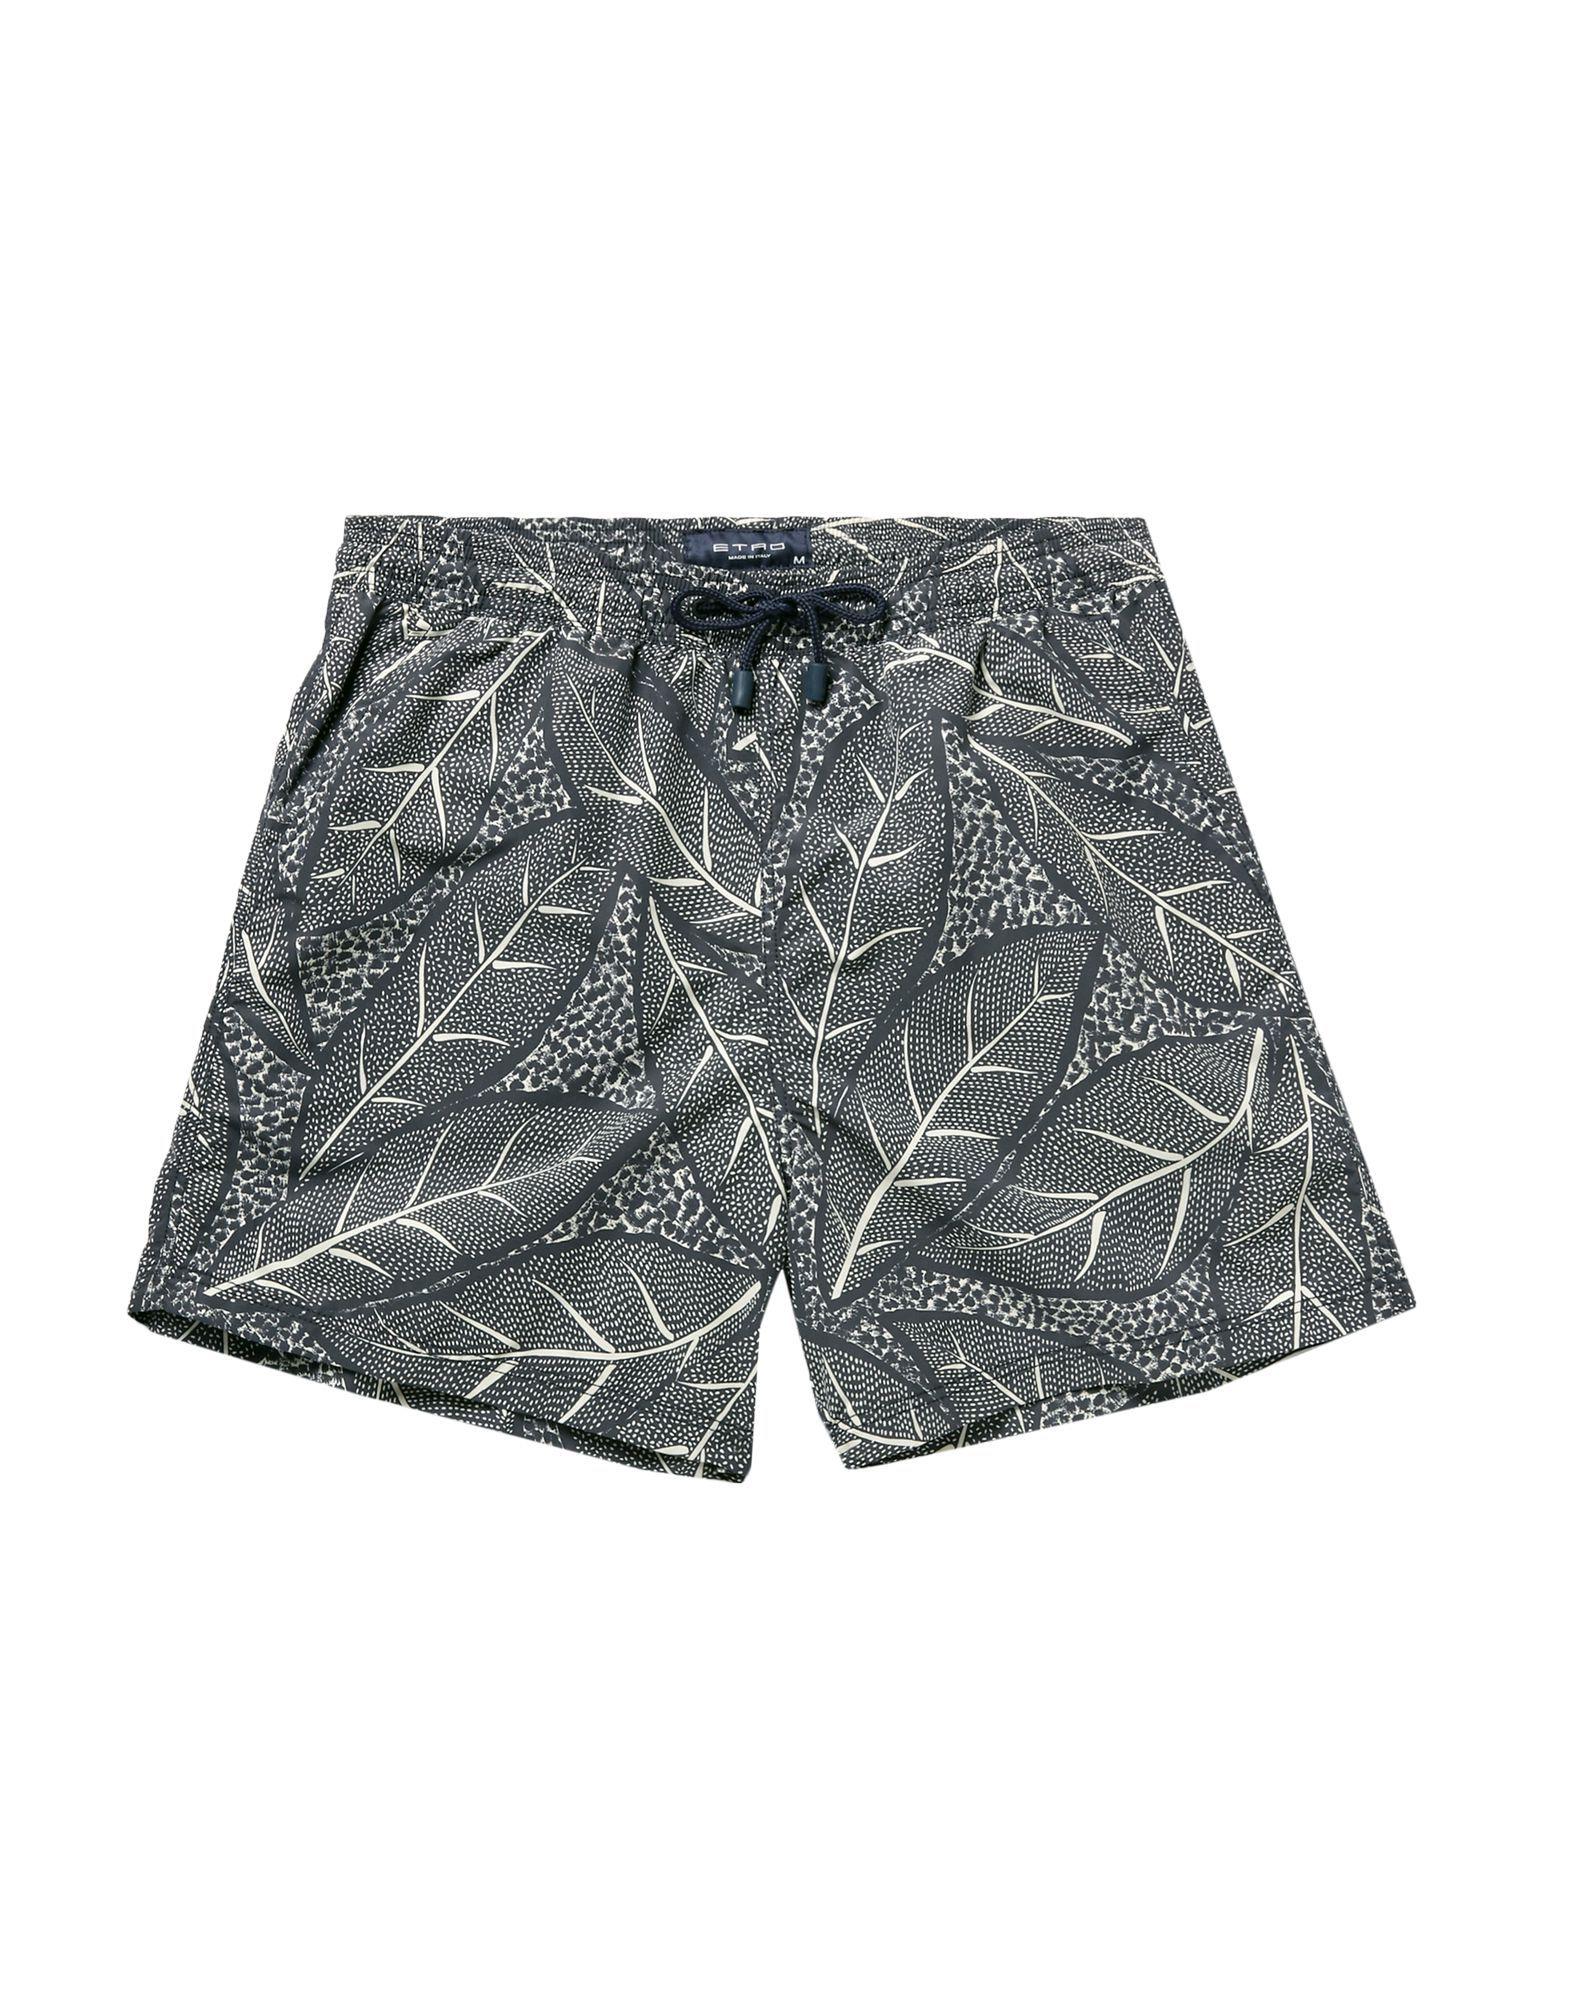 b42831320a ETRO SWIM TRUNKS. #etro #cloth   Etro in 2019   Swim shorts, Swim ...